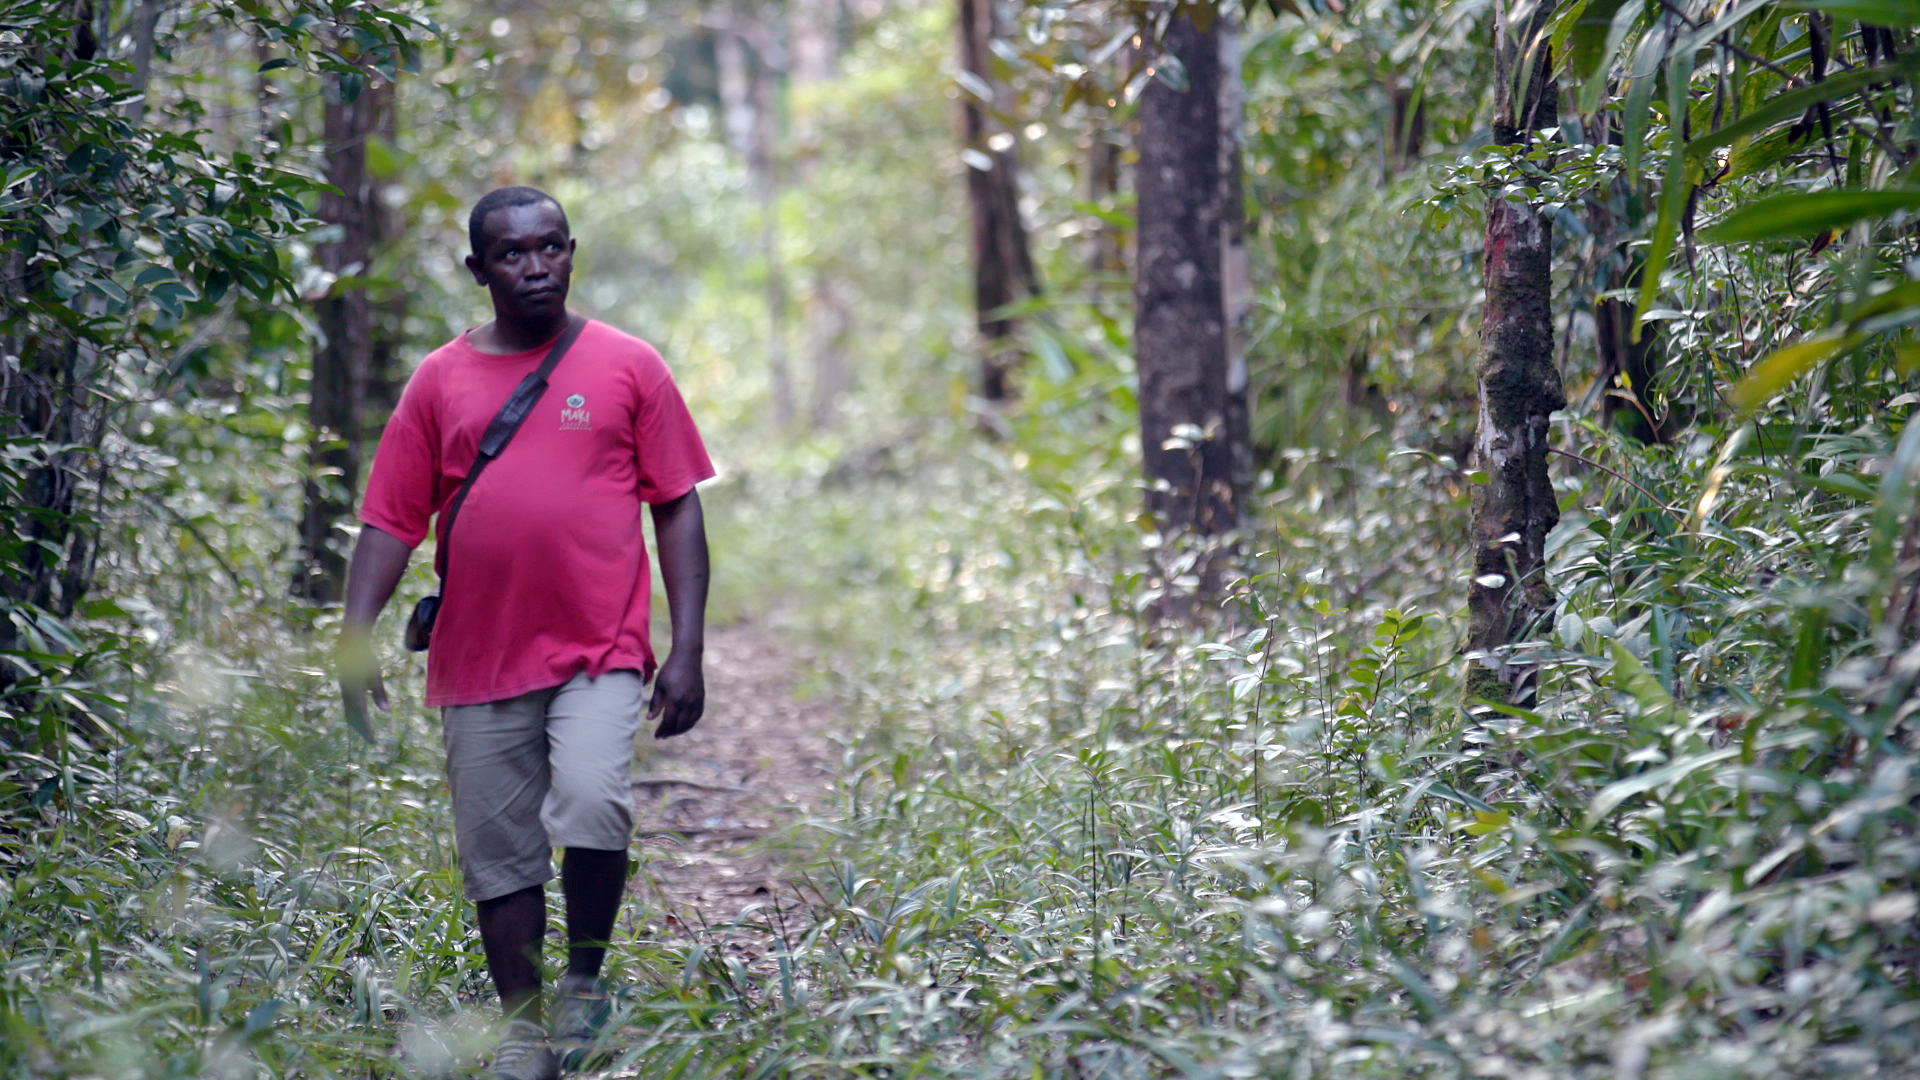 Clovis Razafimalala walking in a forest